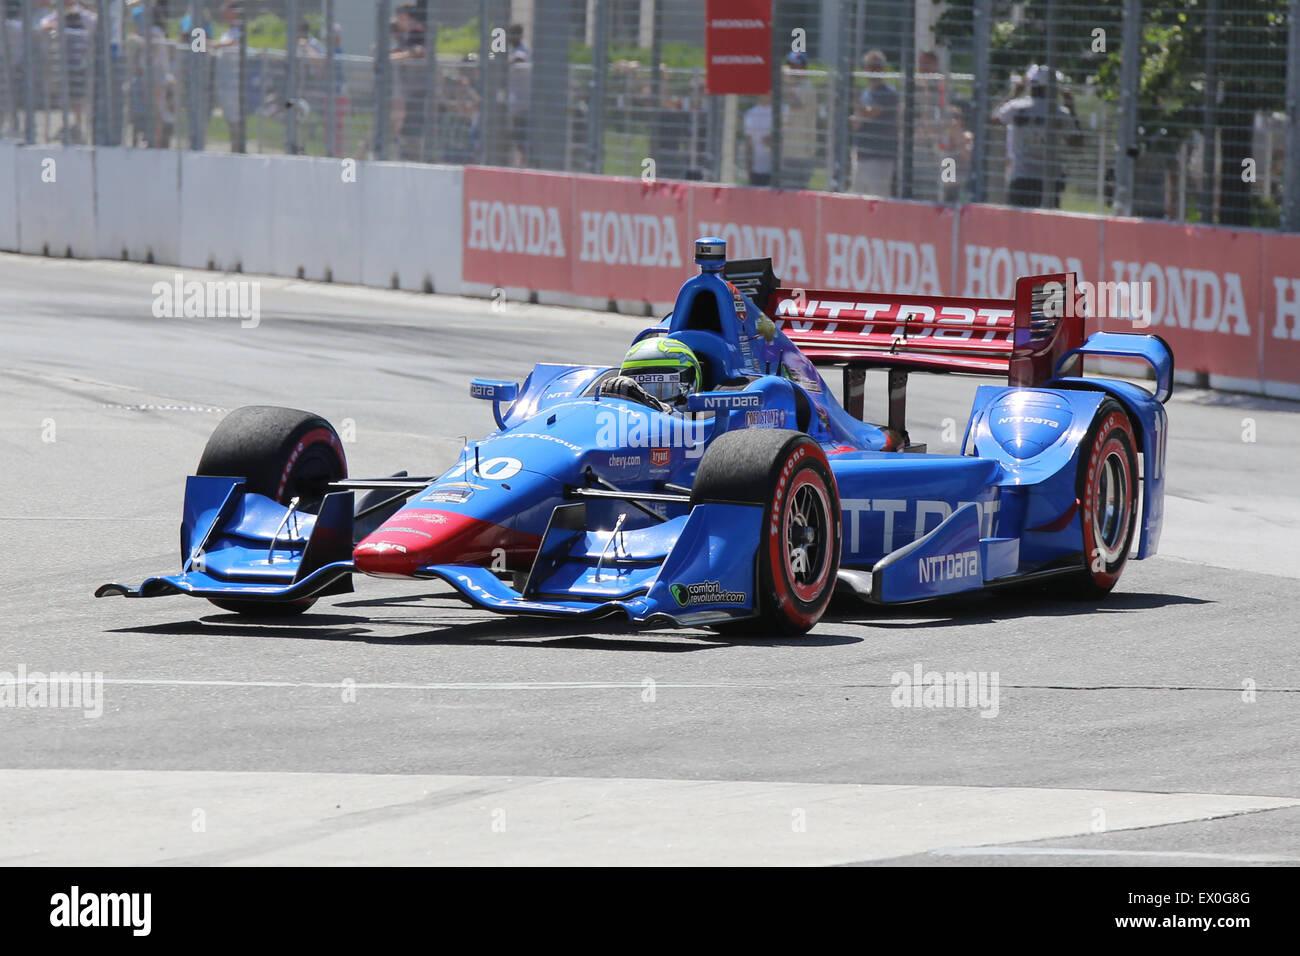 Honda Indy car race formula one Toronto Canada - Stock Image